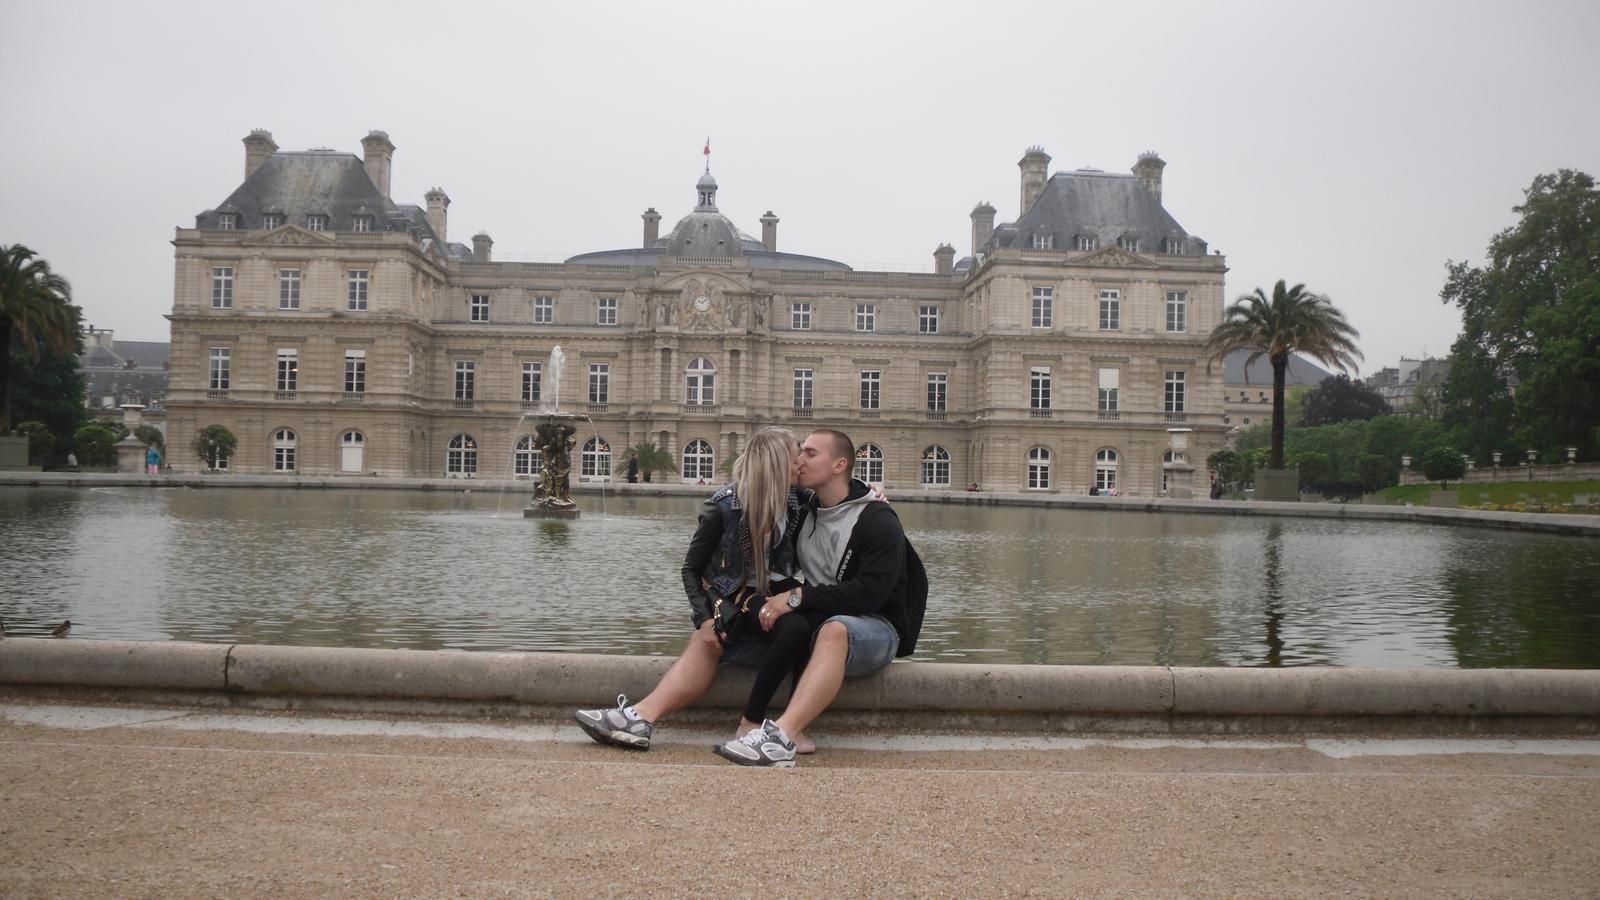 Zásnuby v Paríži 3.5.2014 :) - Obrázok č. 5